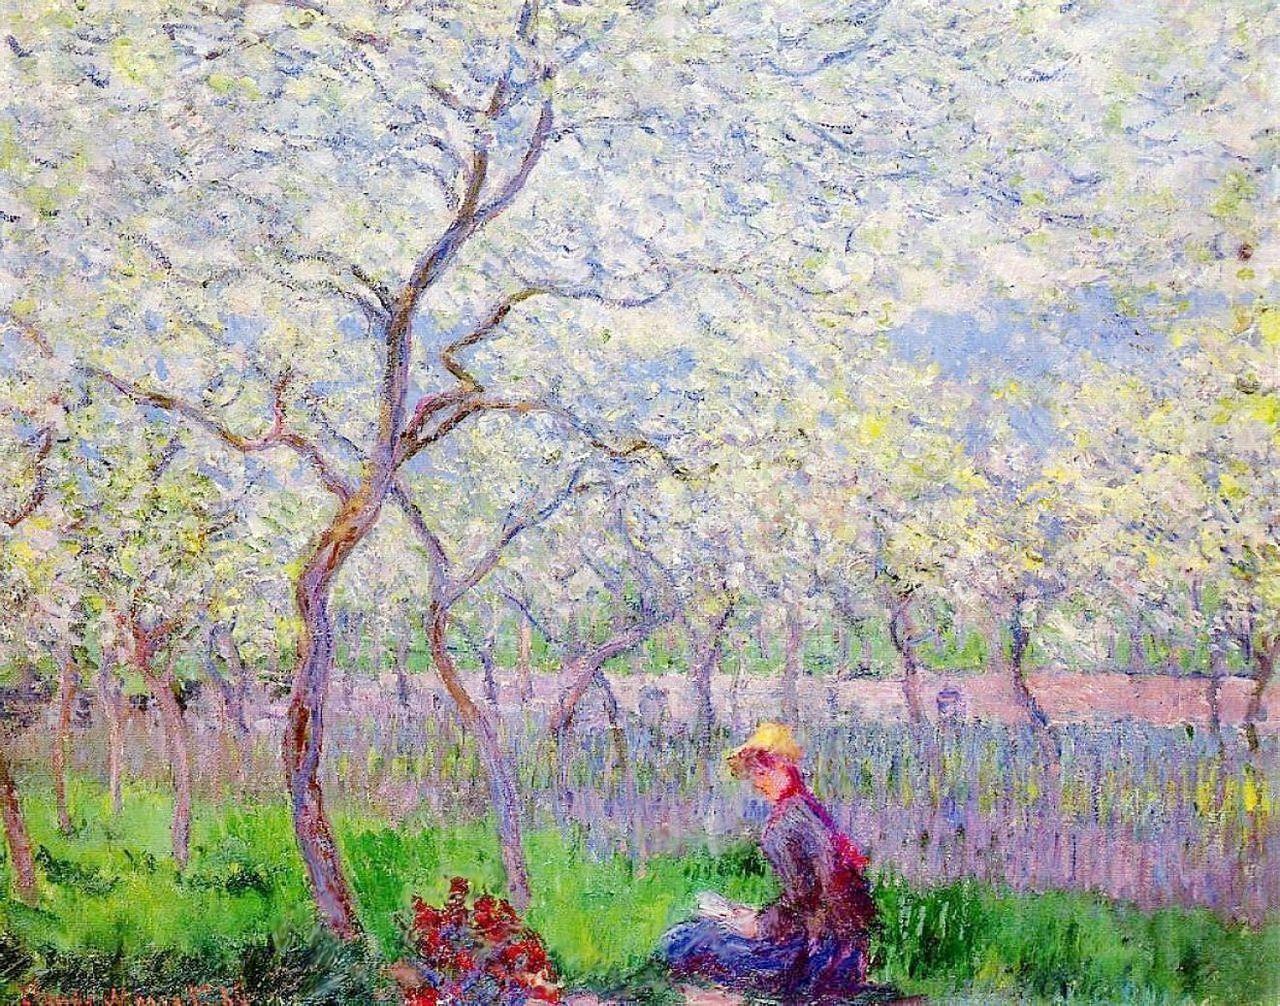 пейзаж < Сад Орхард весной >:: Клод Моне, описание картины - Моне Клод (Claude Monet) фото